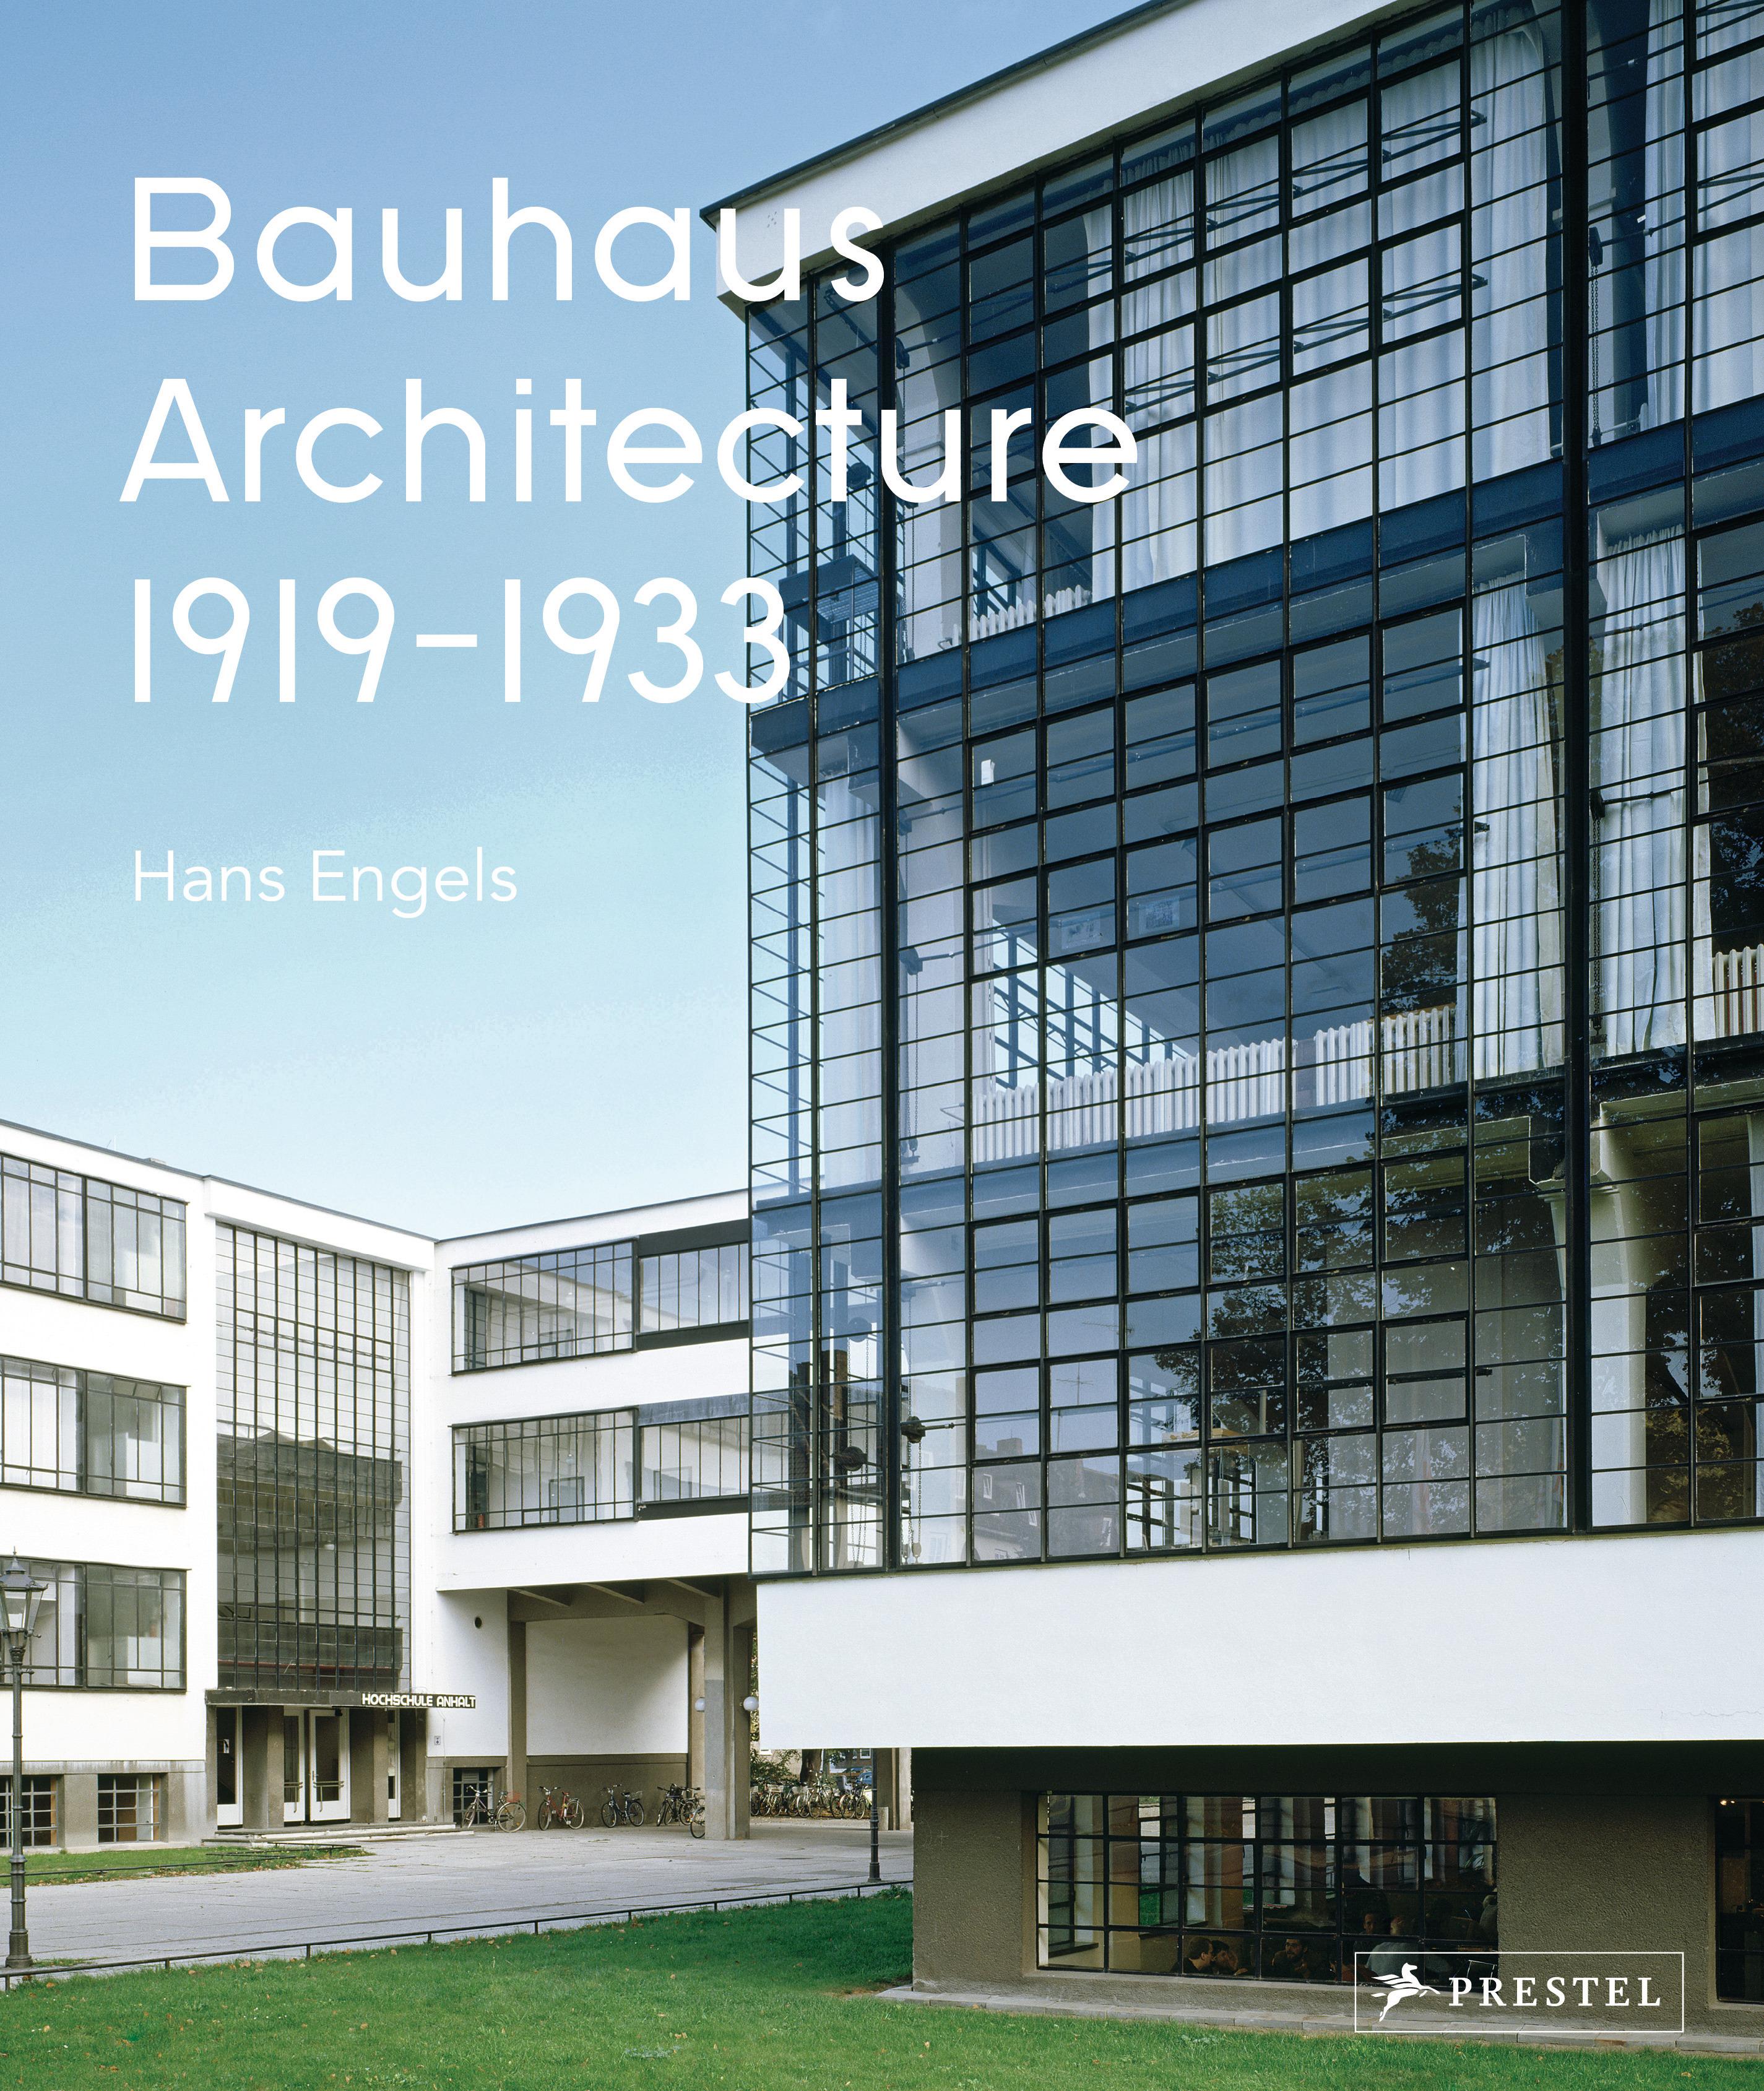 Bauhaus Architecture. Prestel Publishing (Hardcover